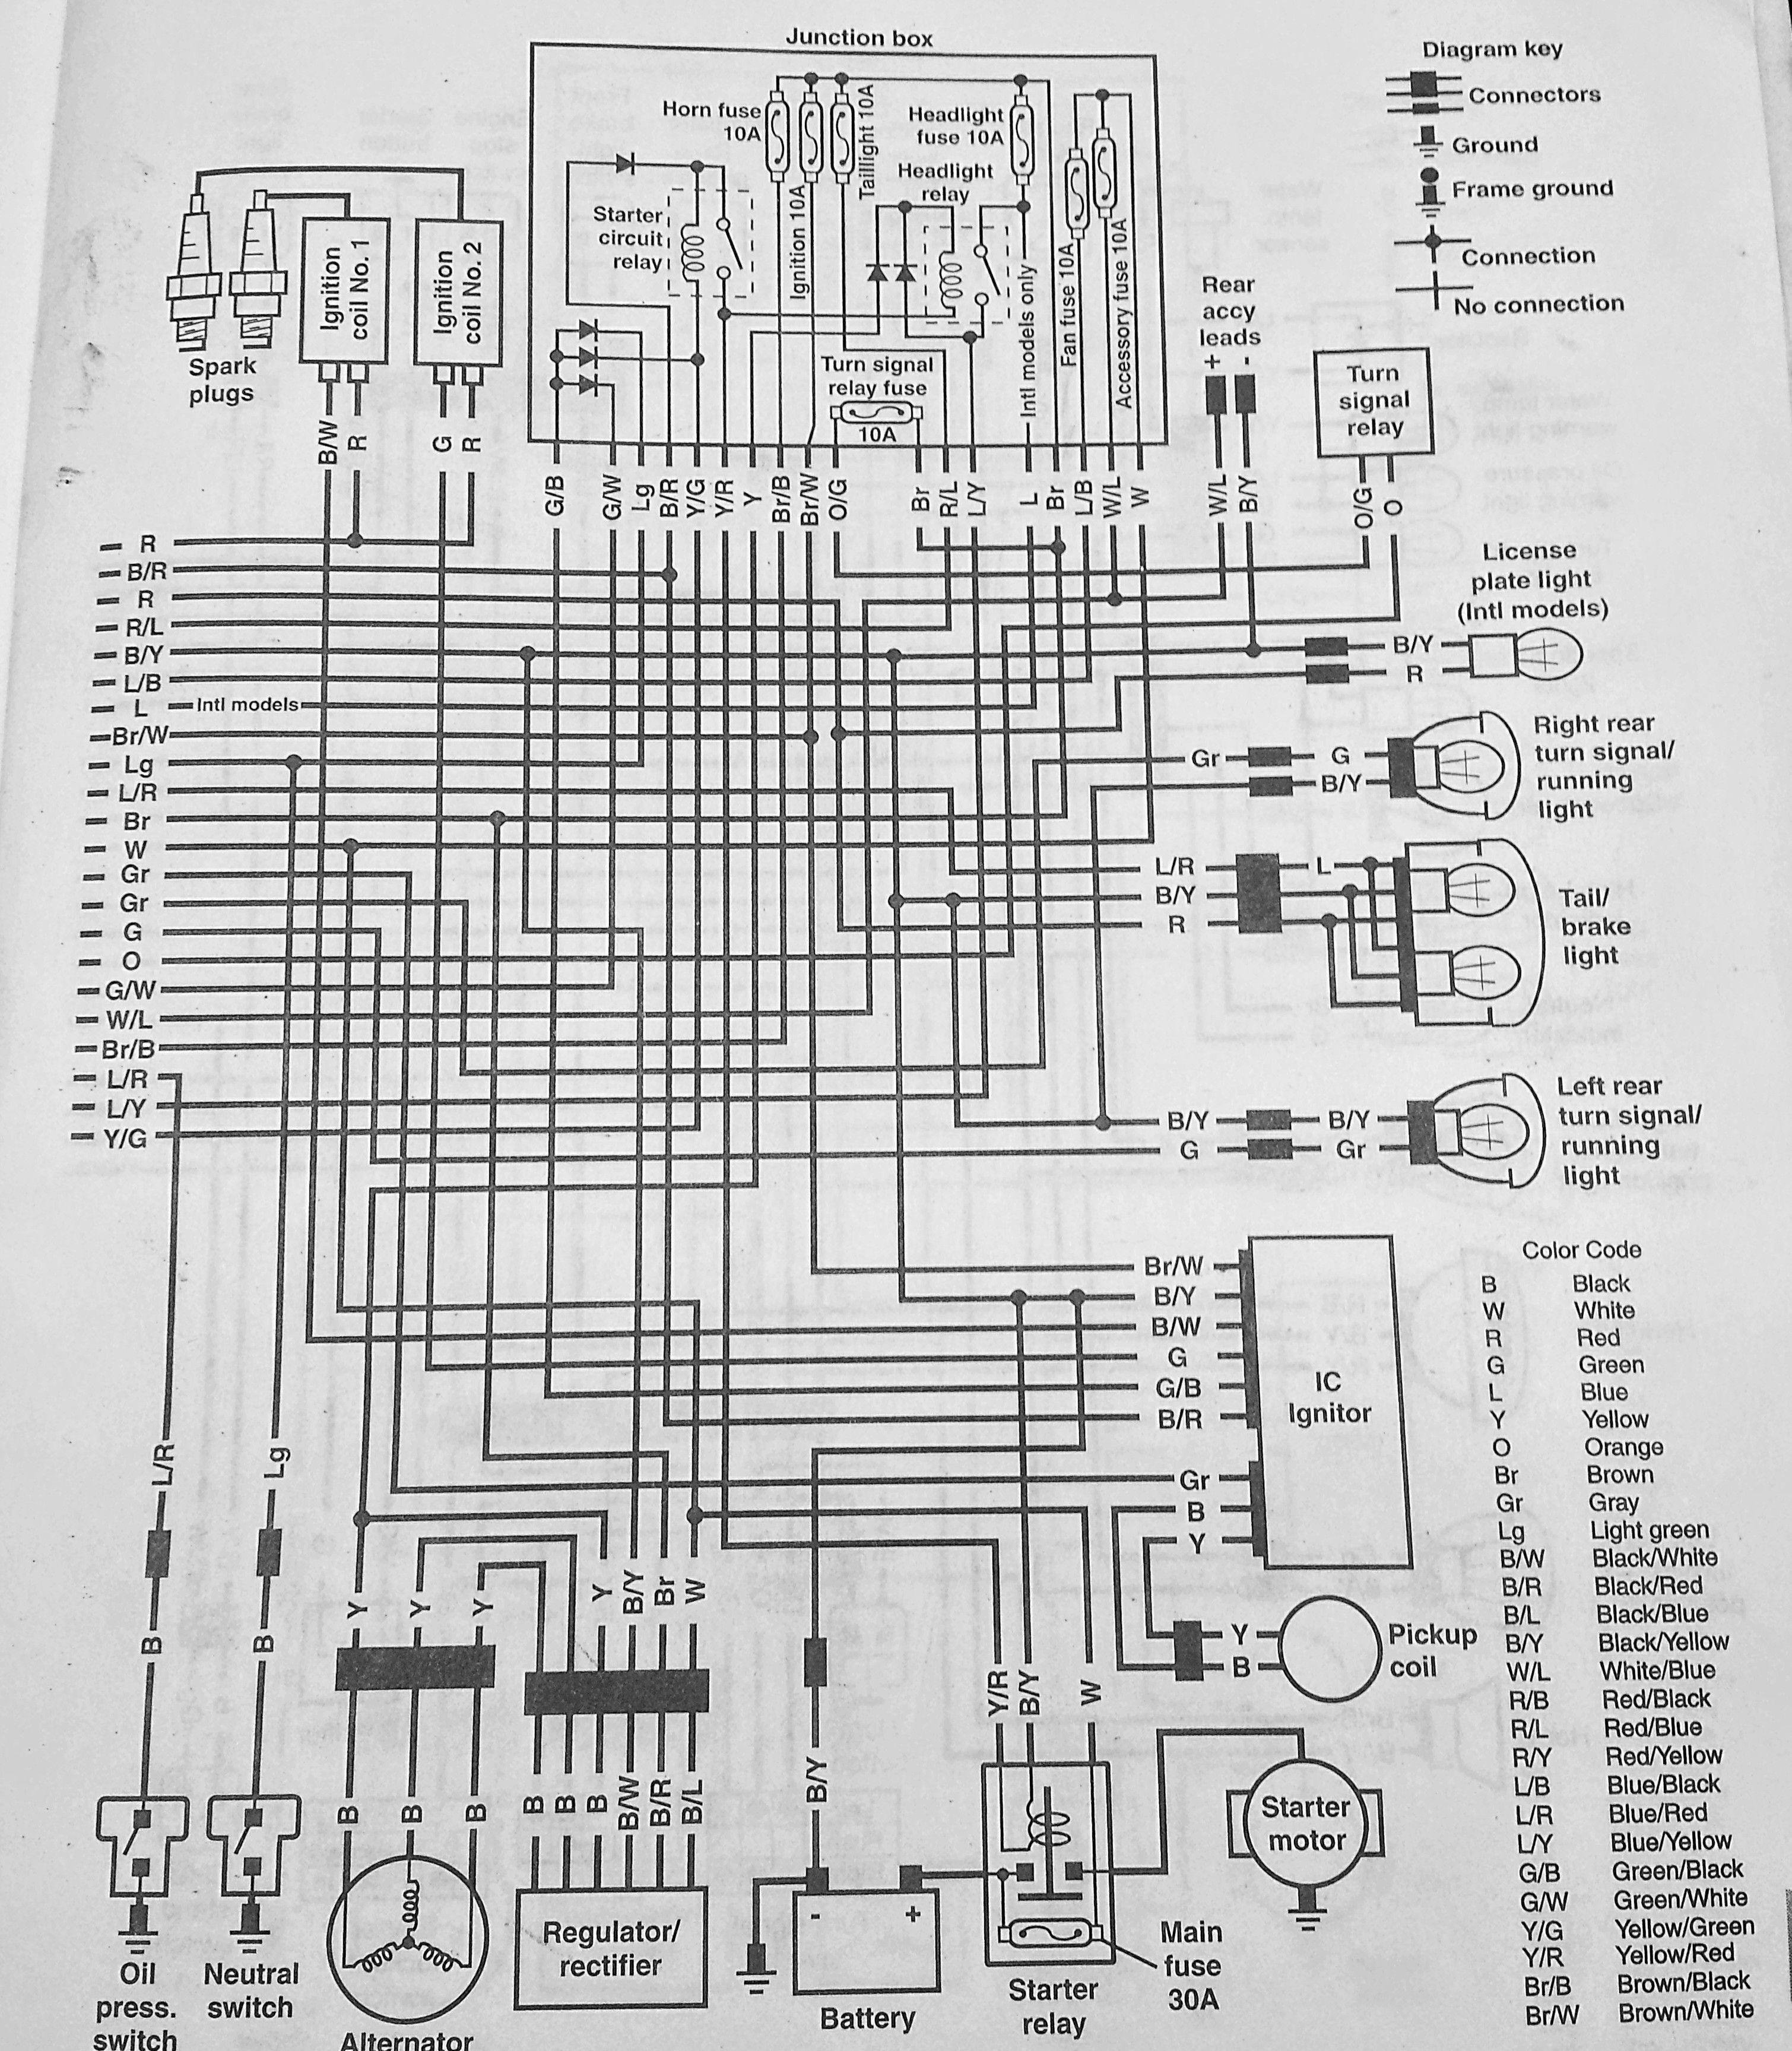 Zx12r Wiring Diagram Excellent Electrical House 2000 Arctic Cat 600 Zx12 U2022 Rh Asvahosting Com 2002 Zx10r